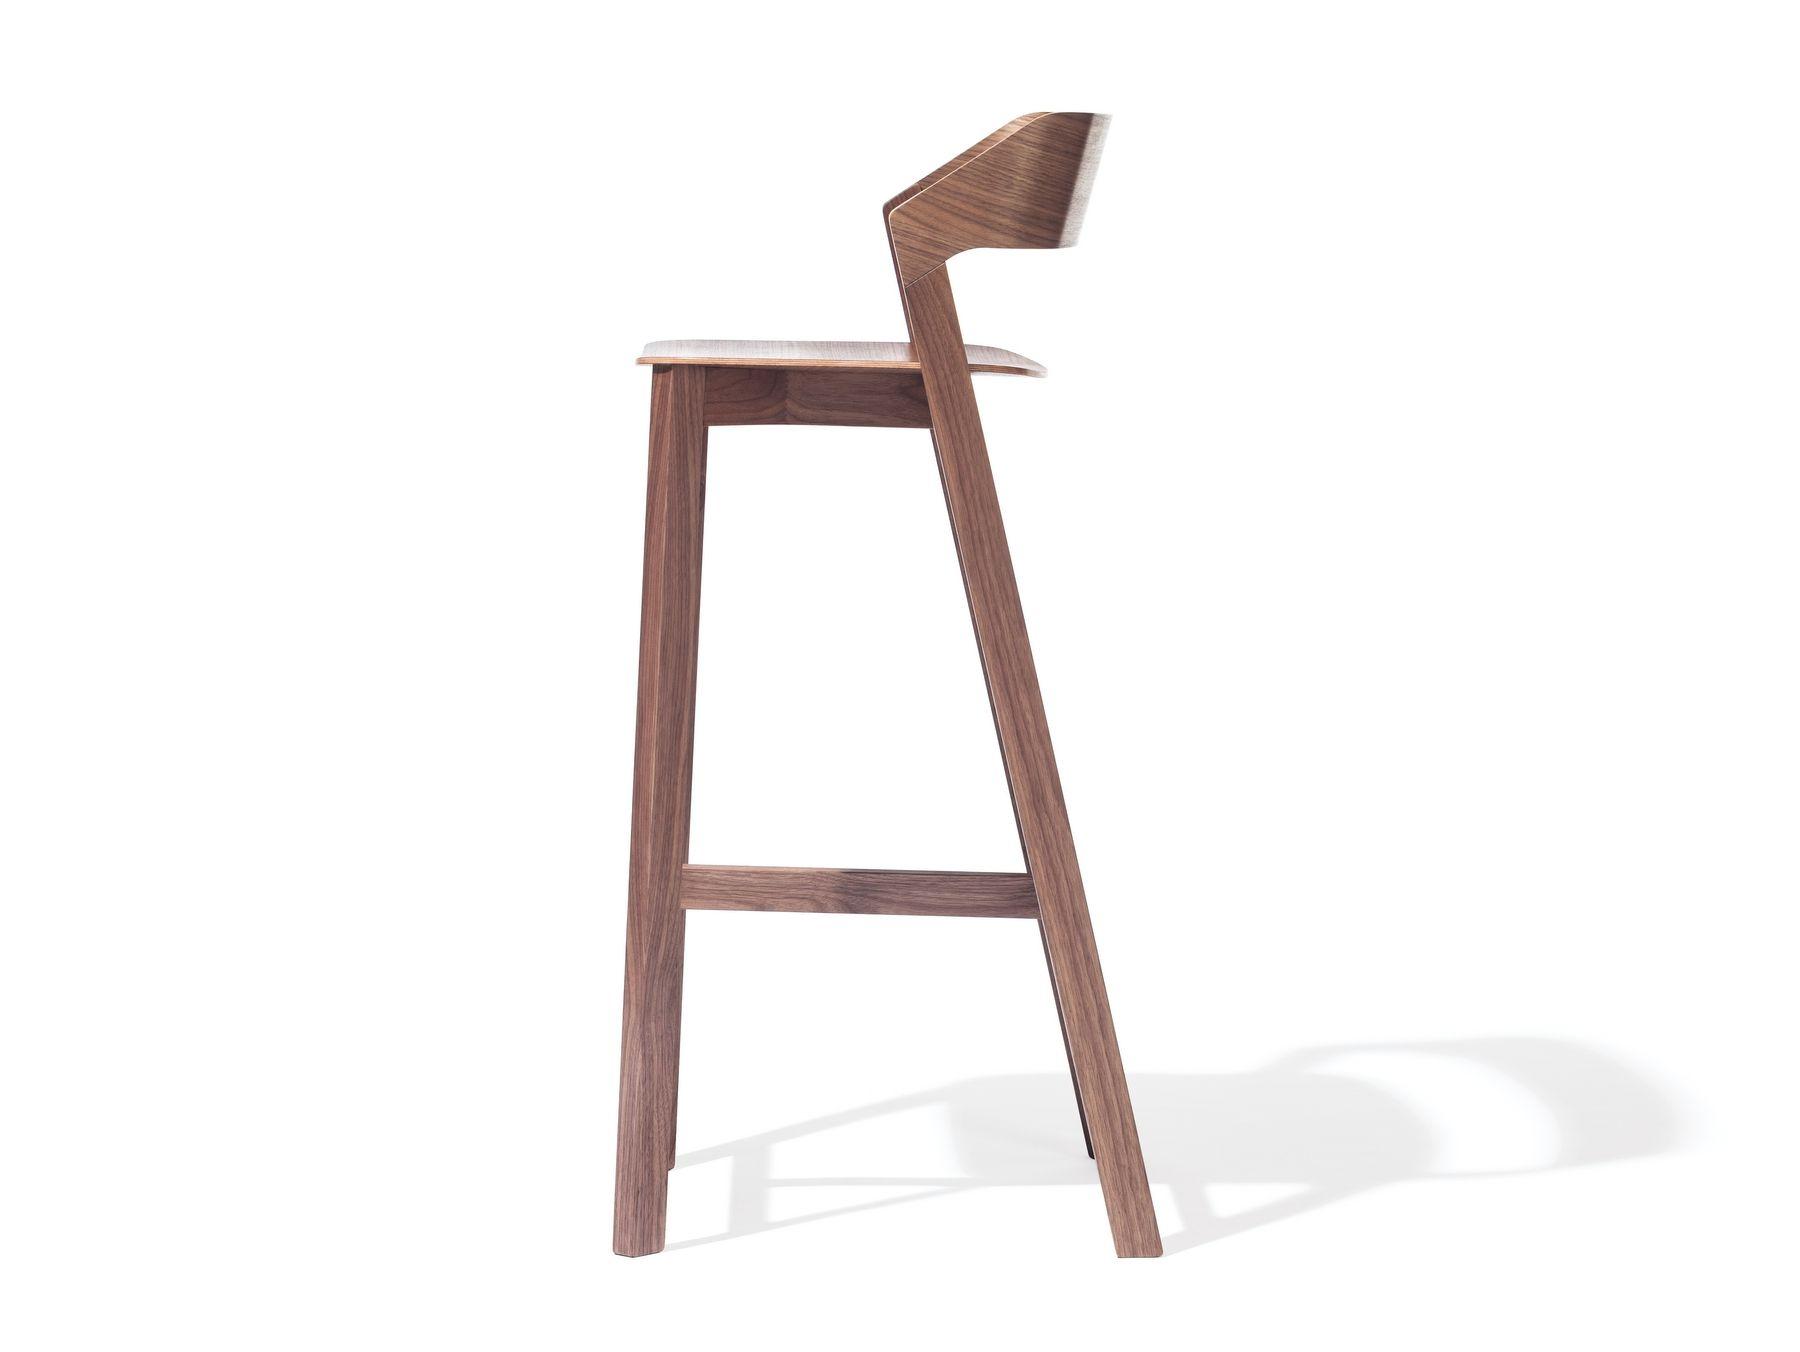 Silla alta de madera maciza con reposapi s merano for Sillas y taburetes de cocina en ikea